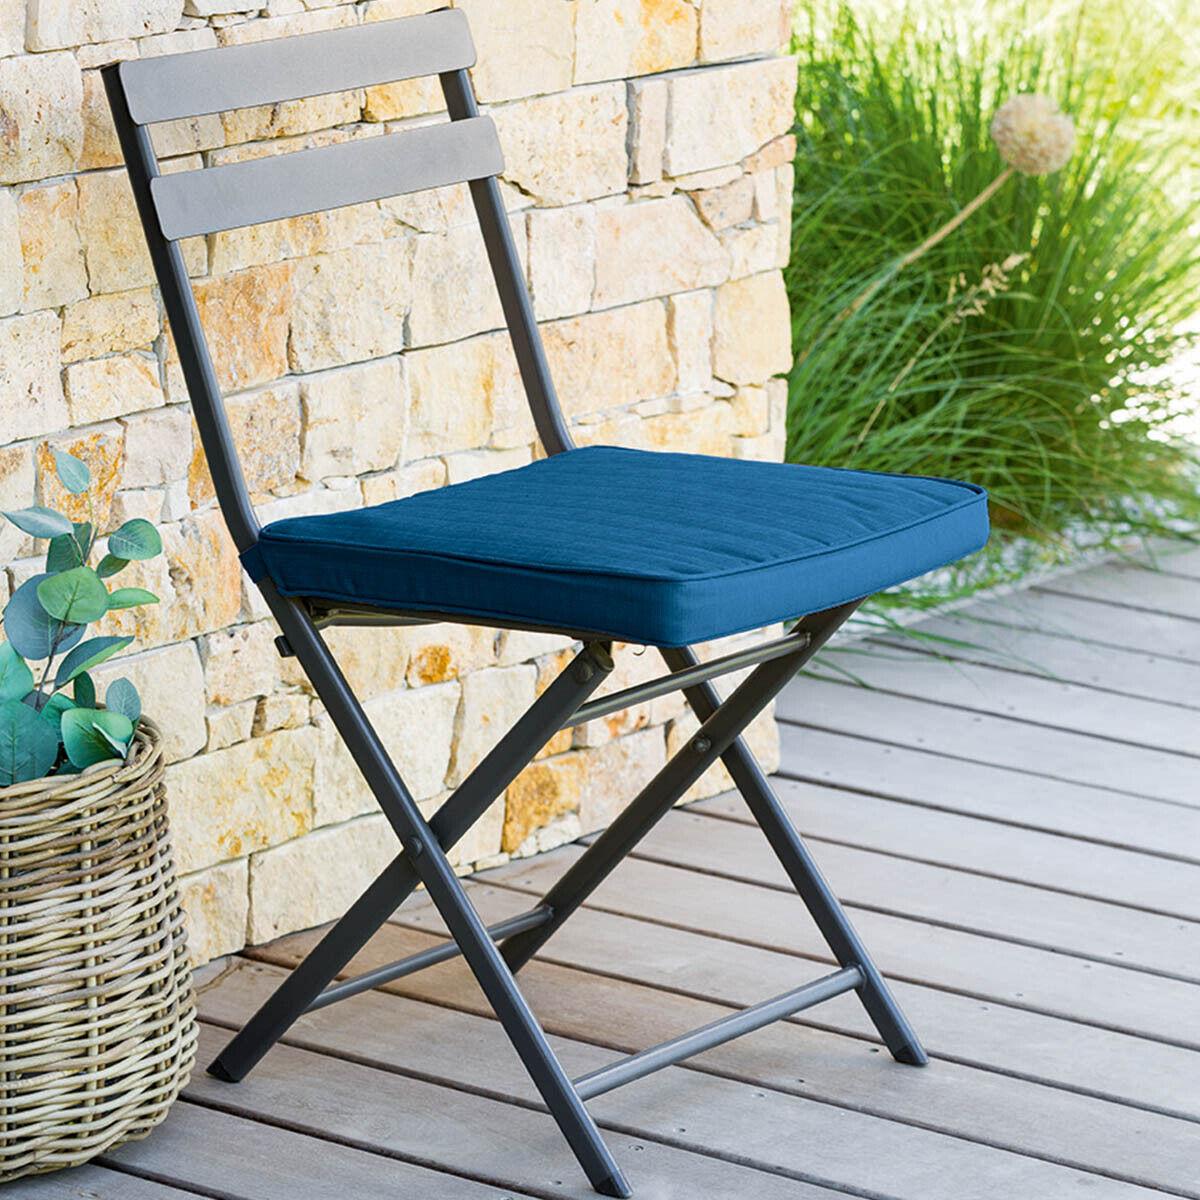 Hespéride Galette de chaise 4 points Korai Bleu indigo Jardin